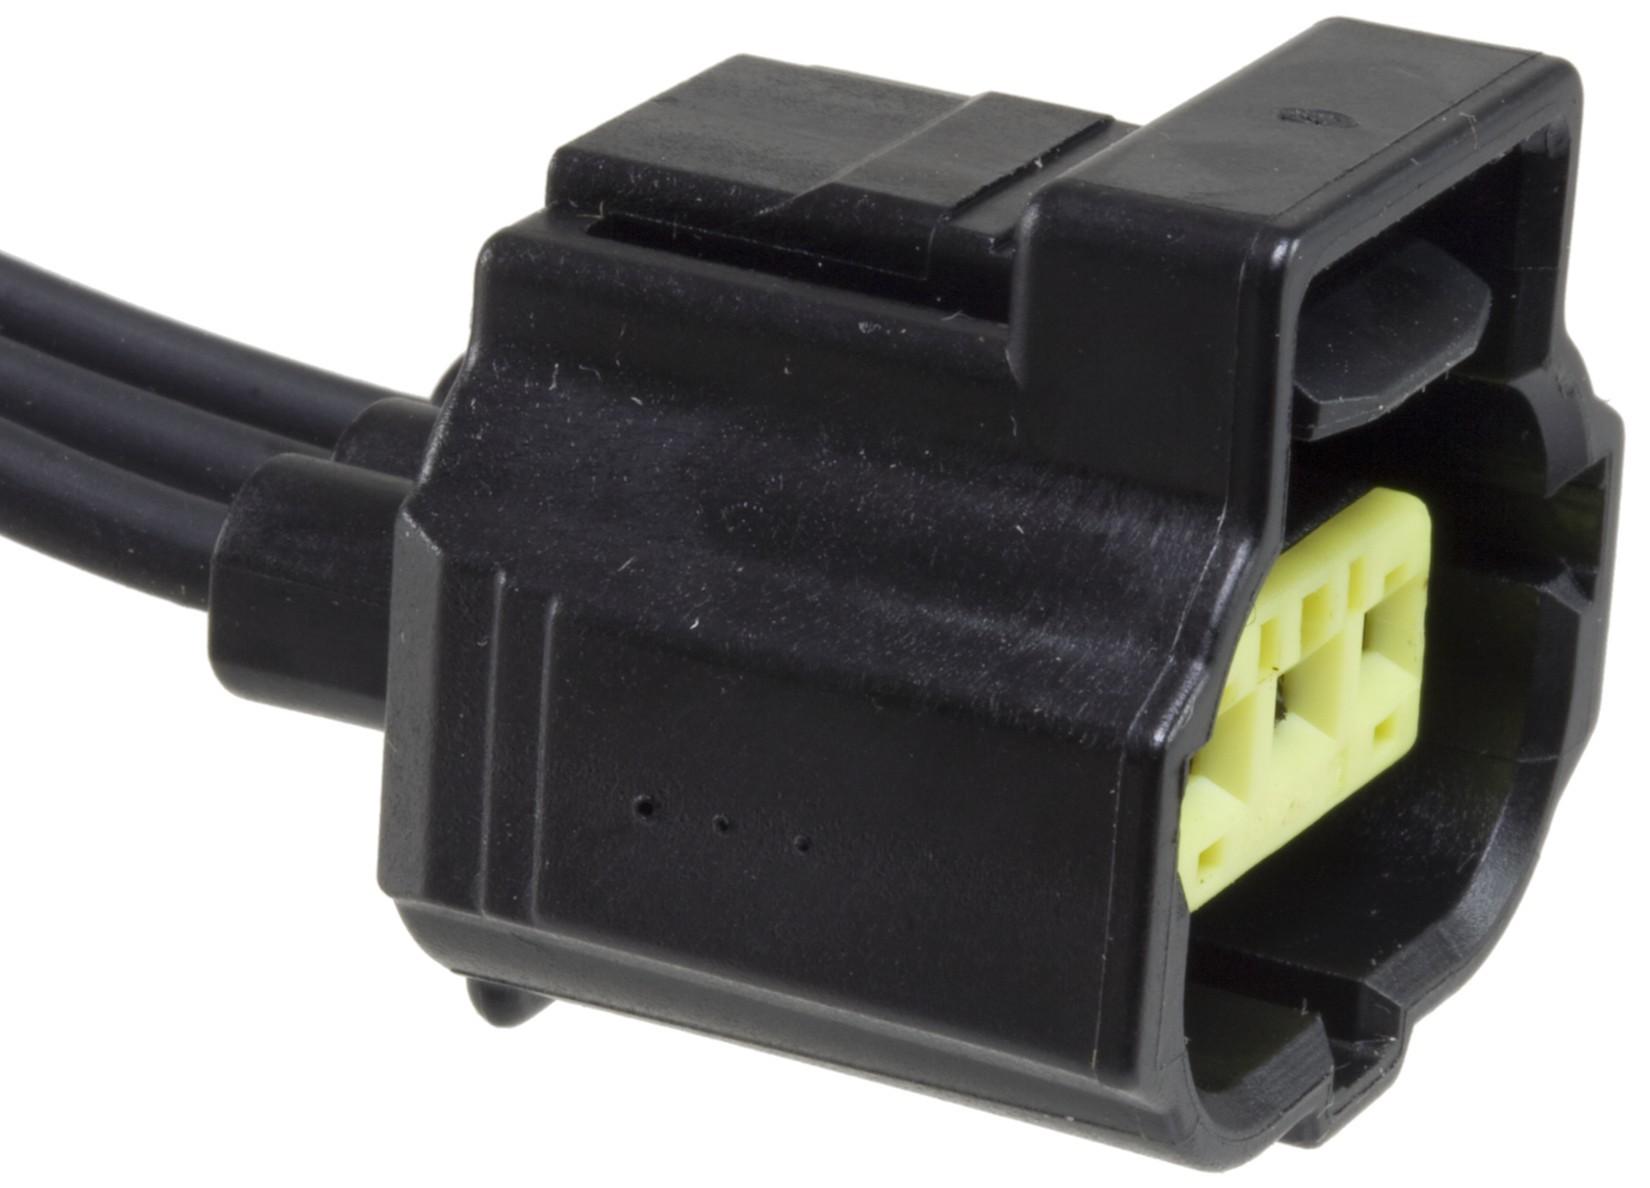 WELLS - Brake Fluid Level Sensor Connector - WEL 611